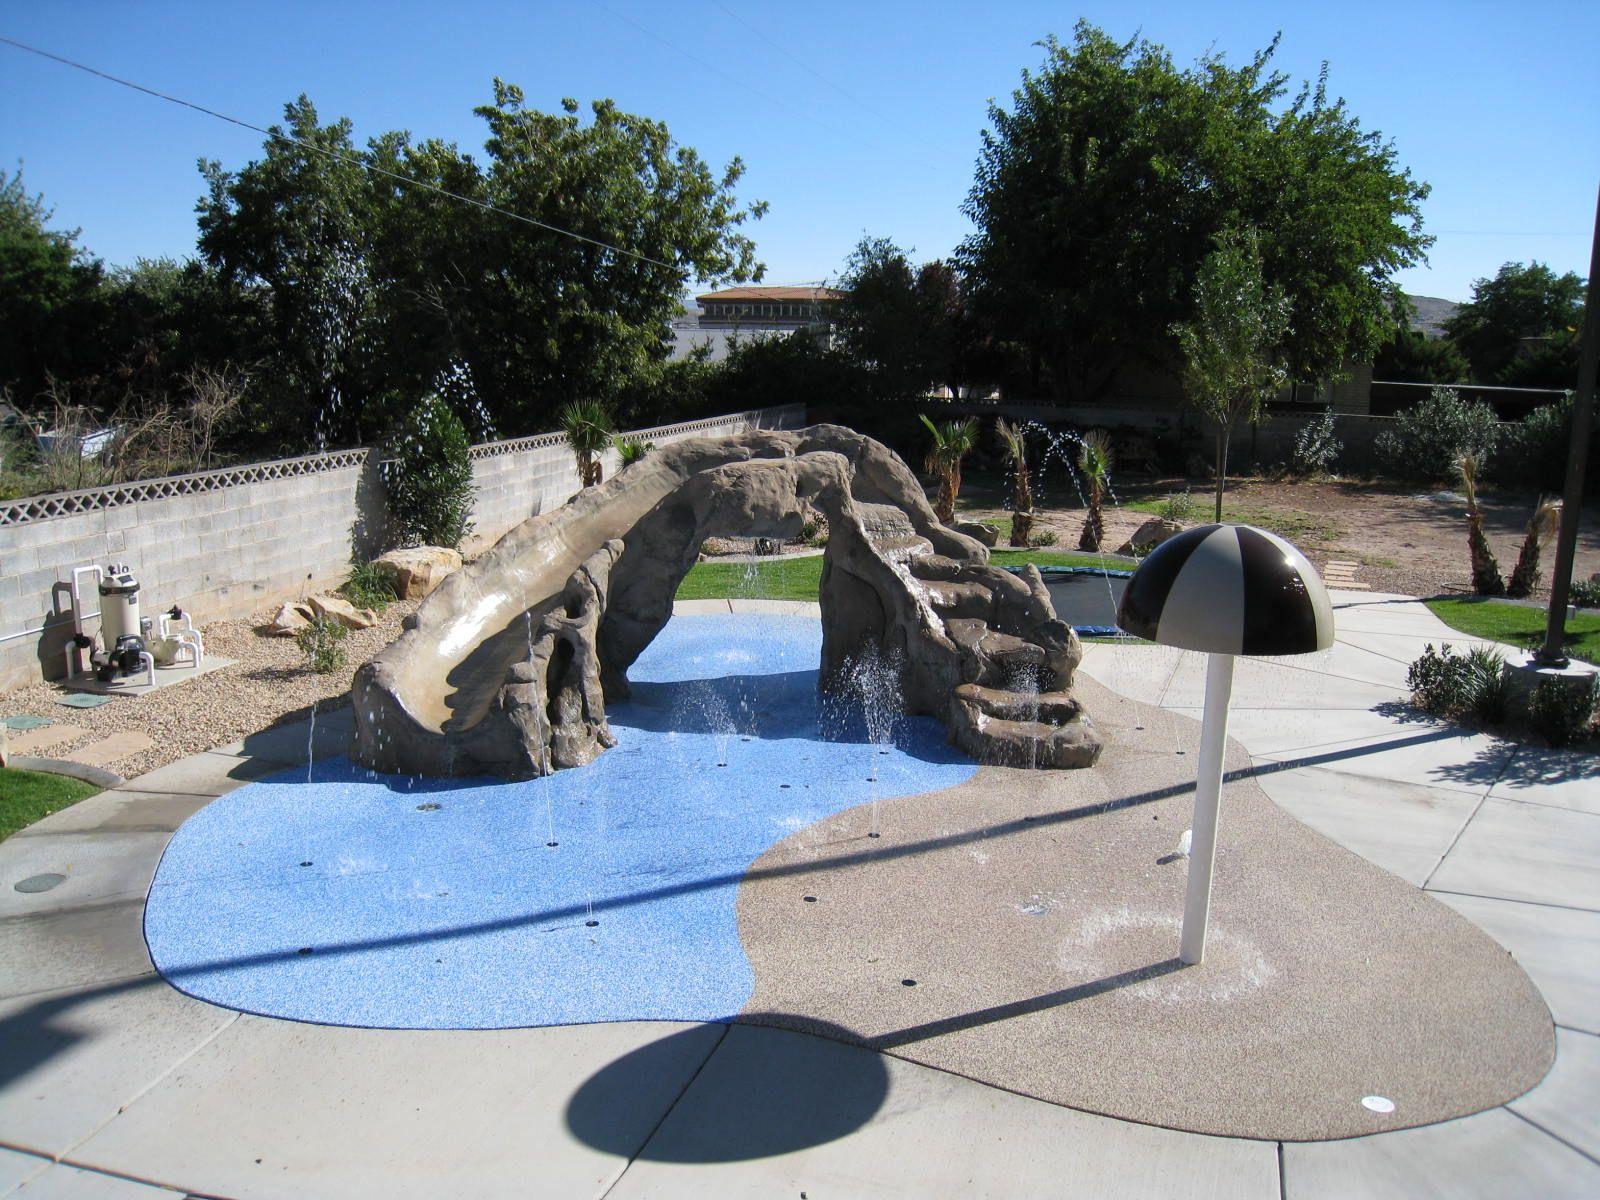 rain deck splash pads splash parks gardens u0026 backyard spaces